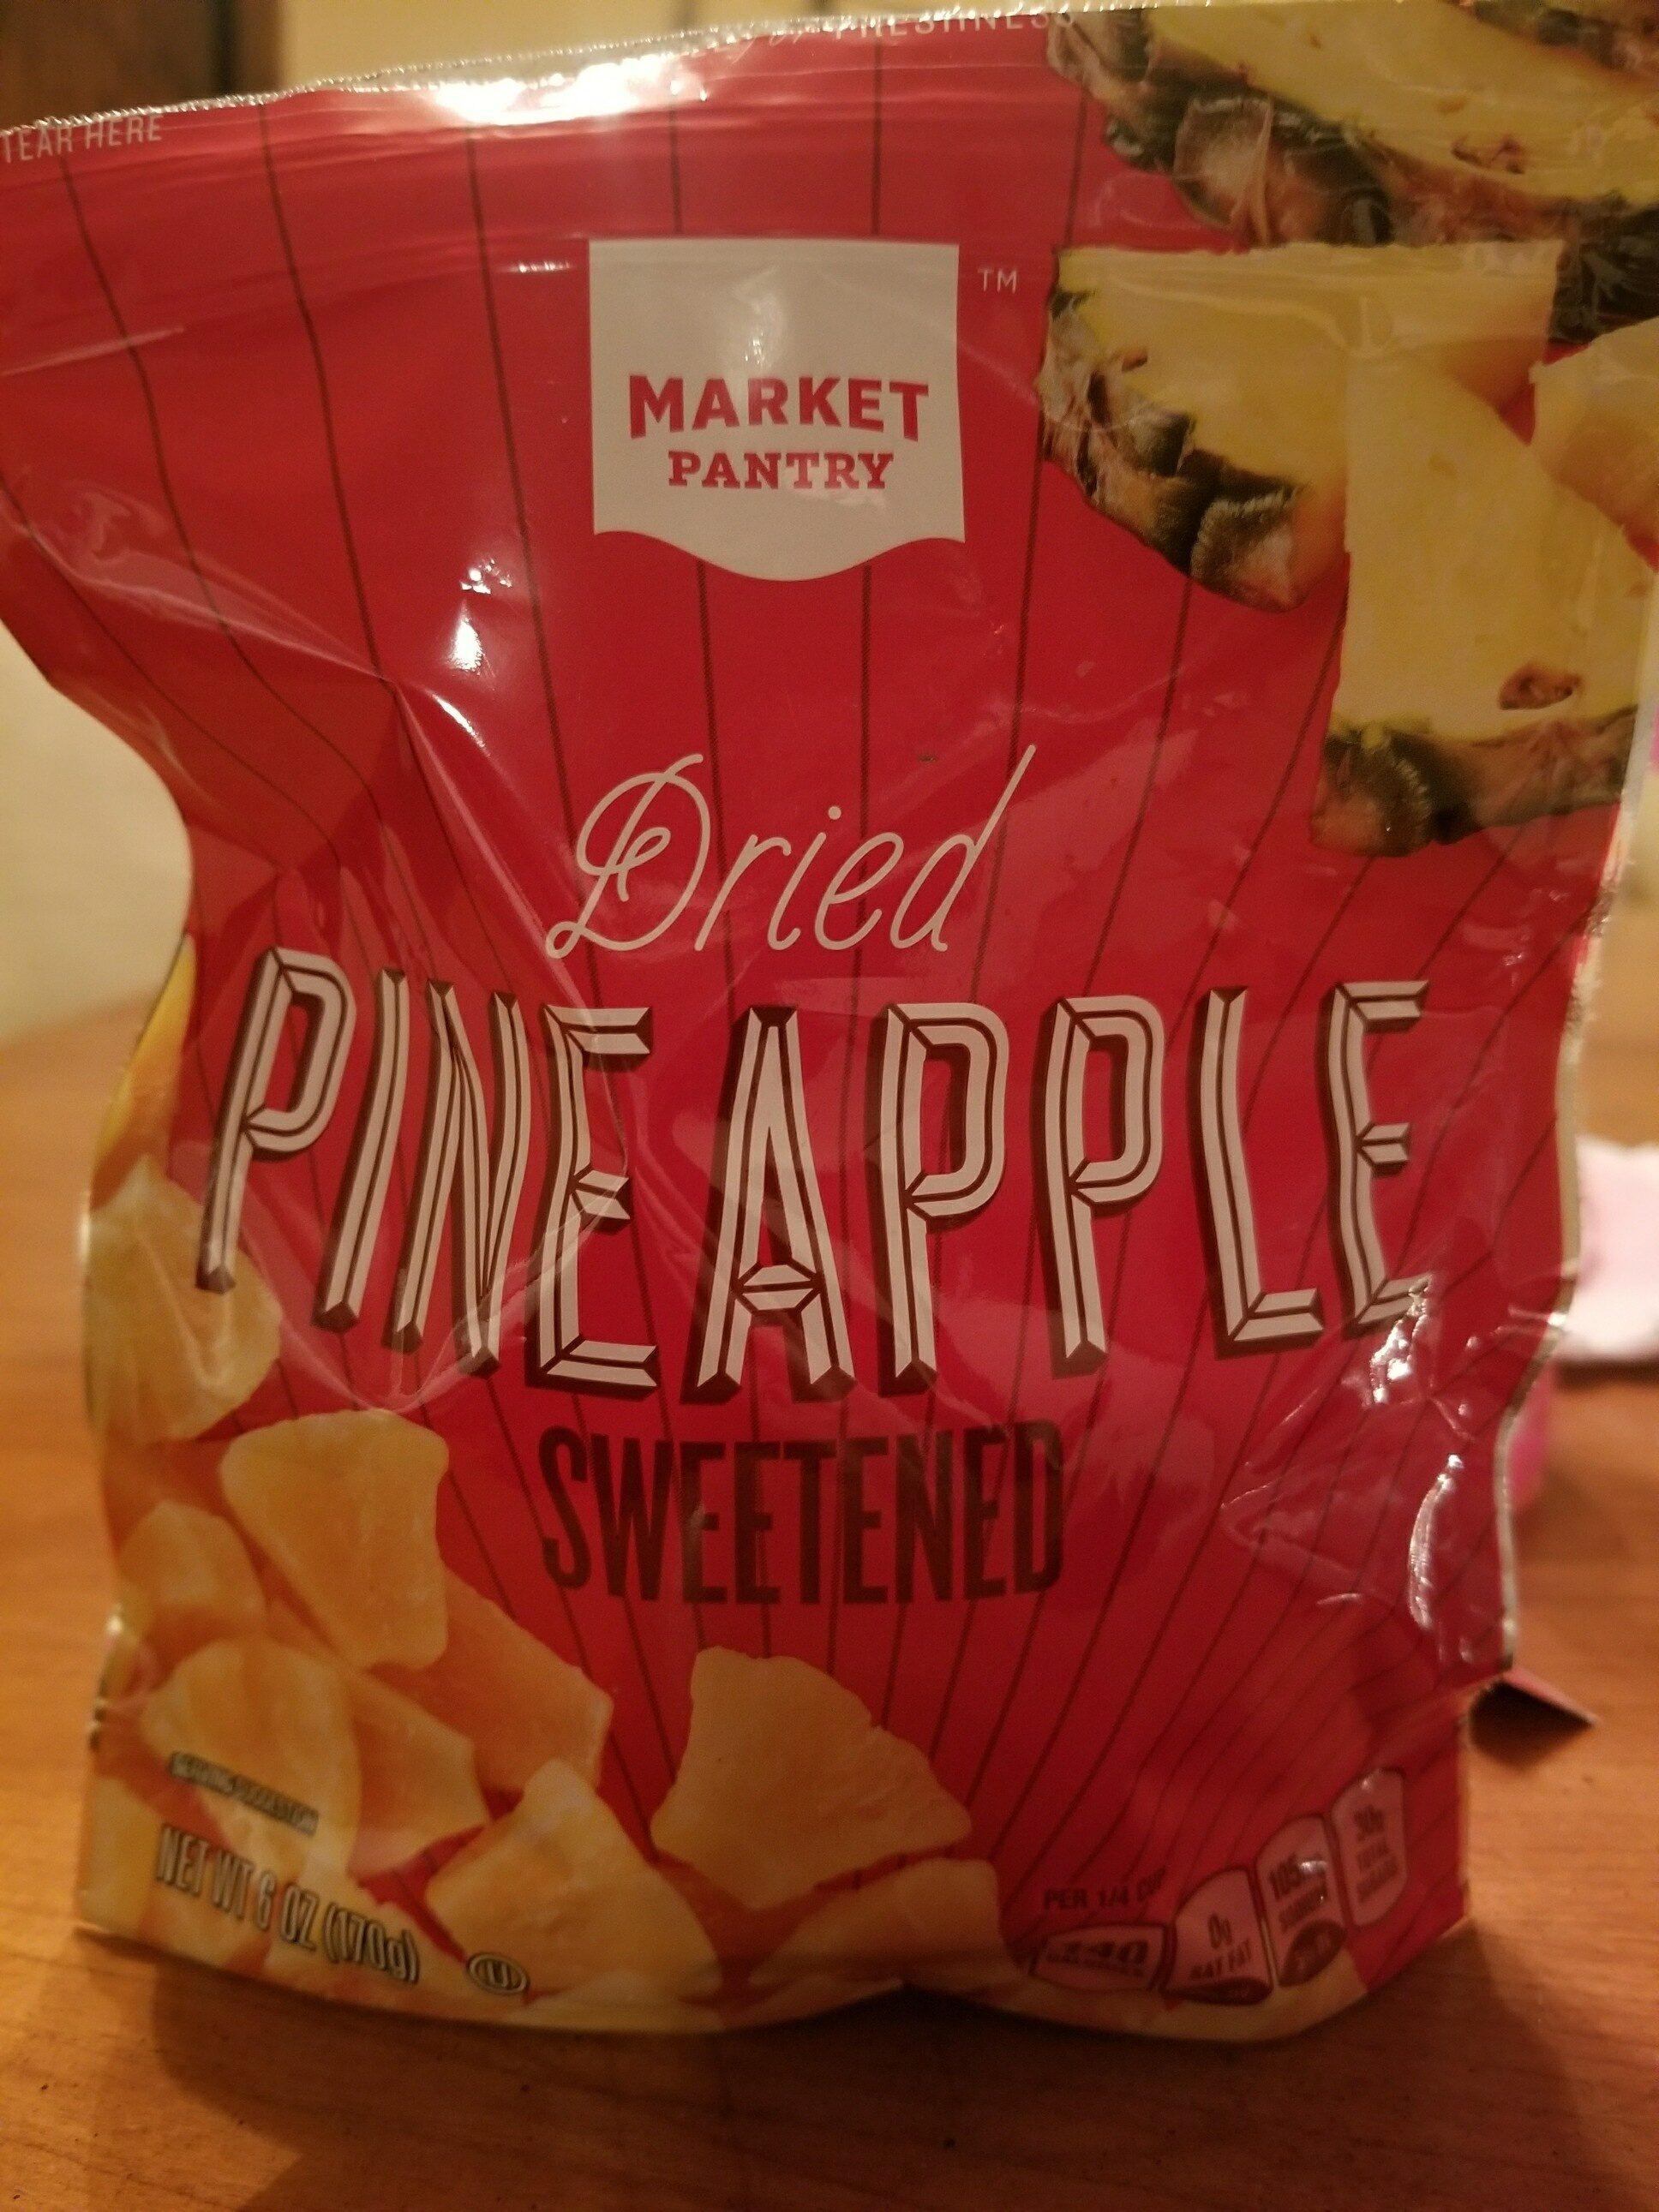 Sweetened dried pineapple - Product - en